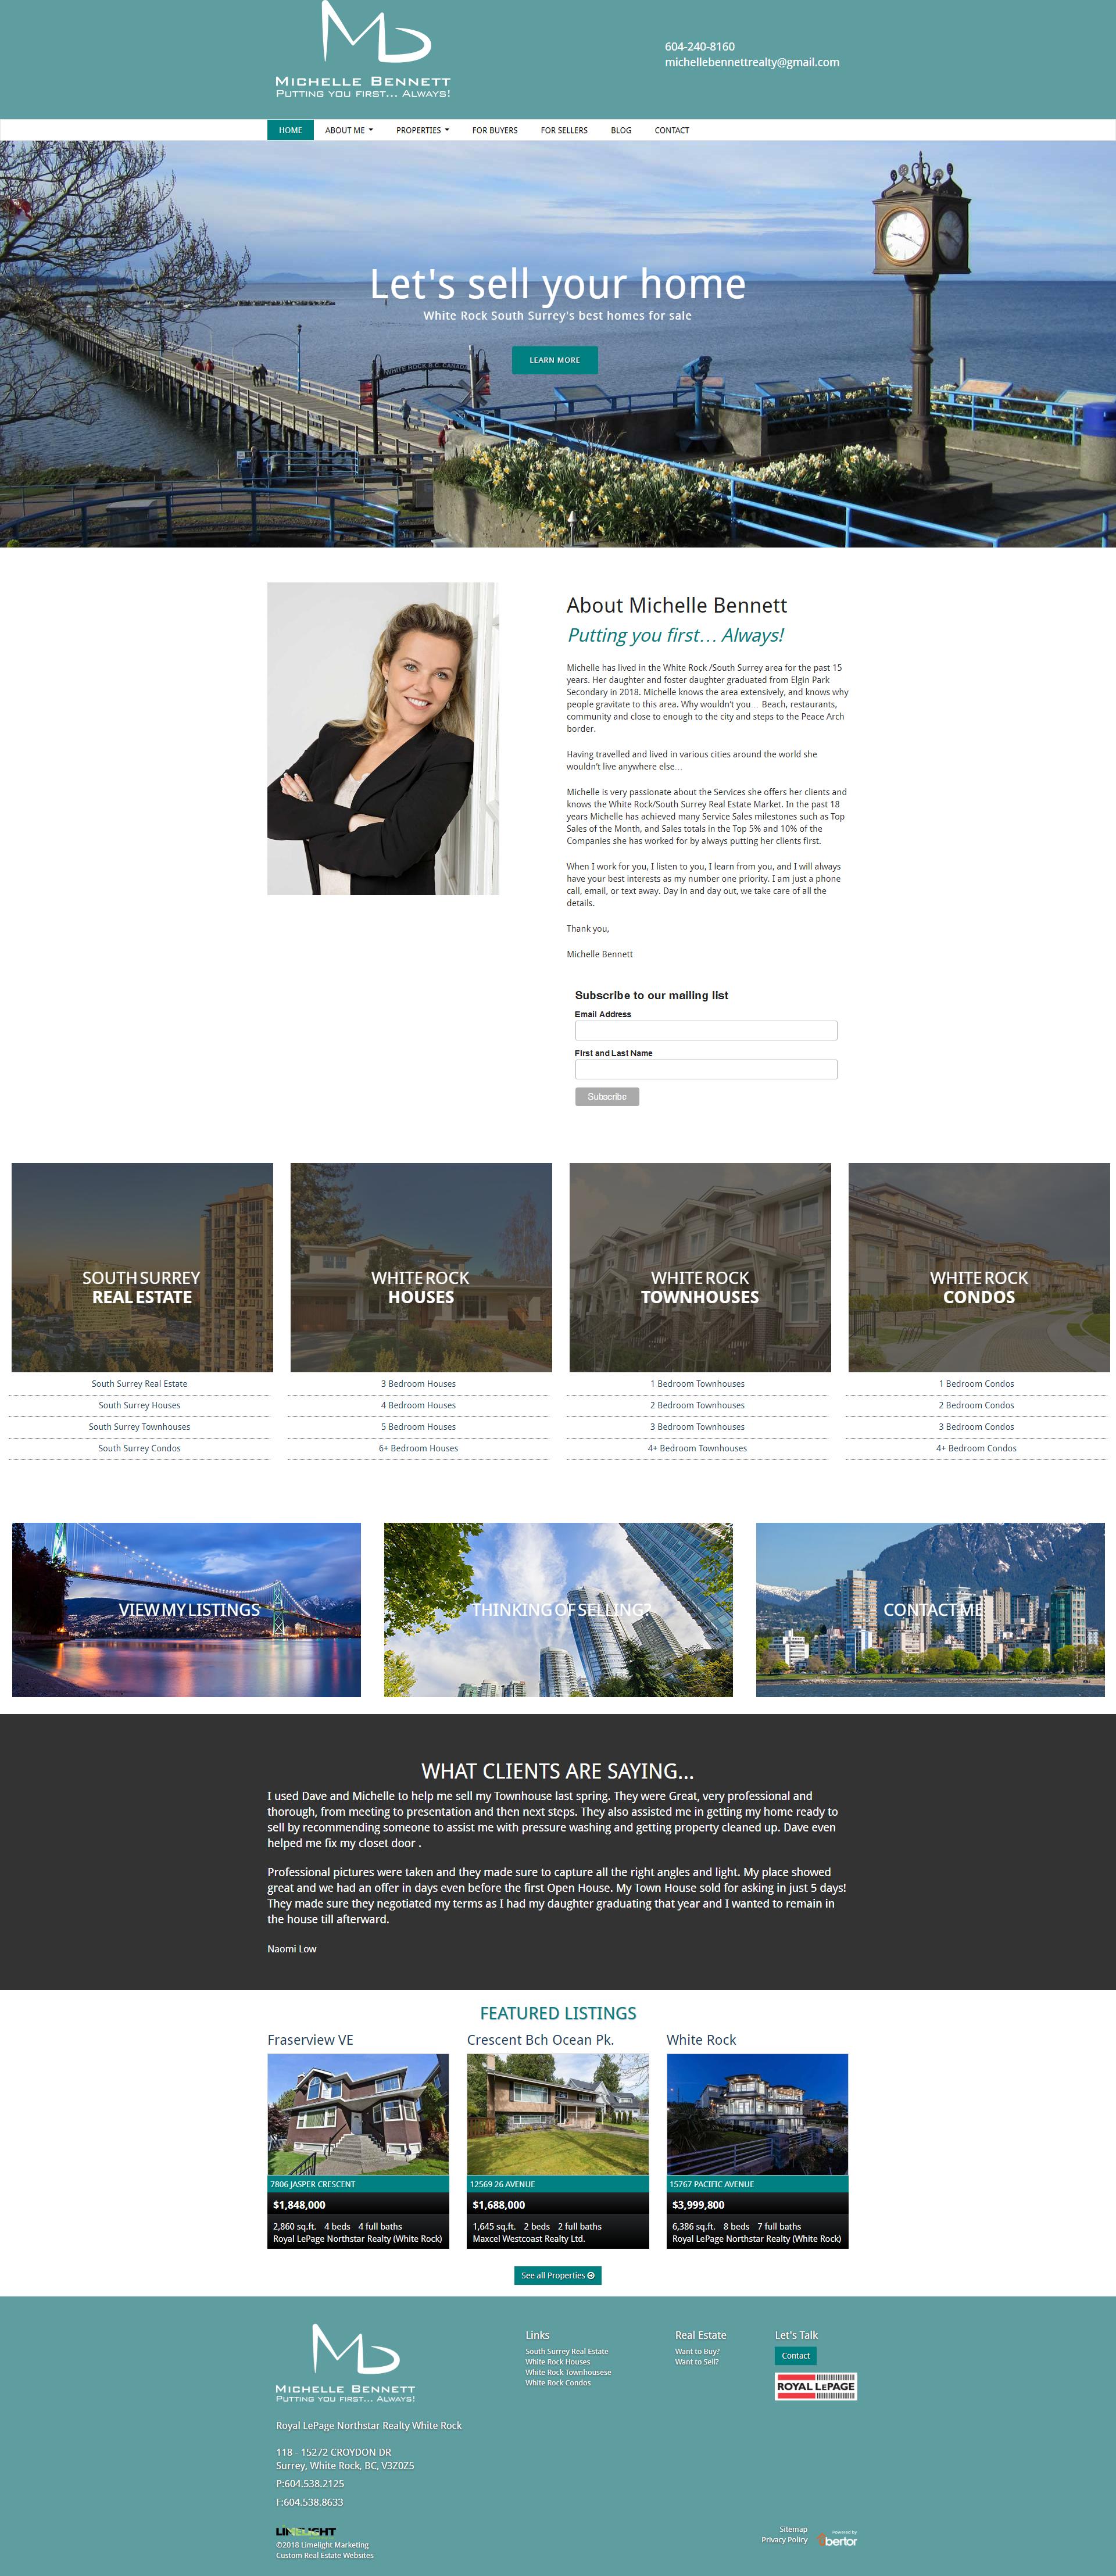 New Website Using The Ubertor Cms For White Rock South Surrey Realtor Michelle Bennett Responsive And Mobile Ready Michelle Bennett Website Design Condo